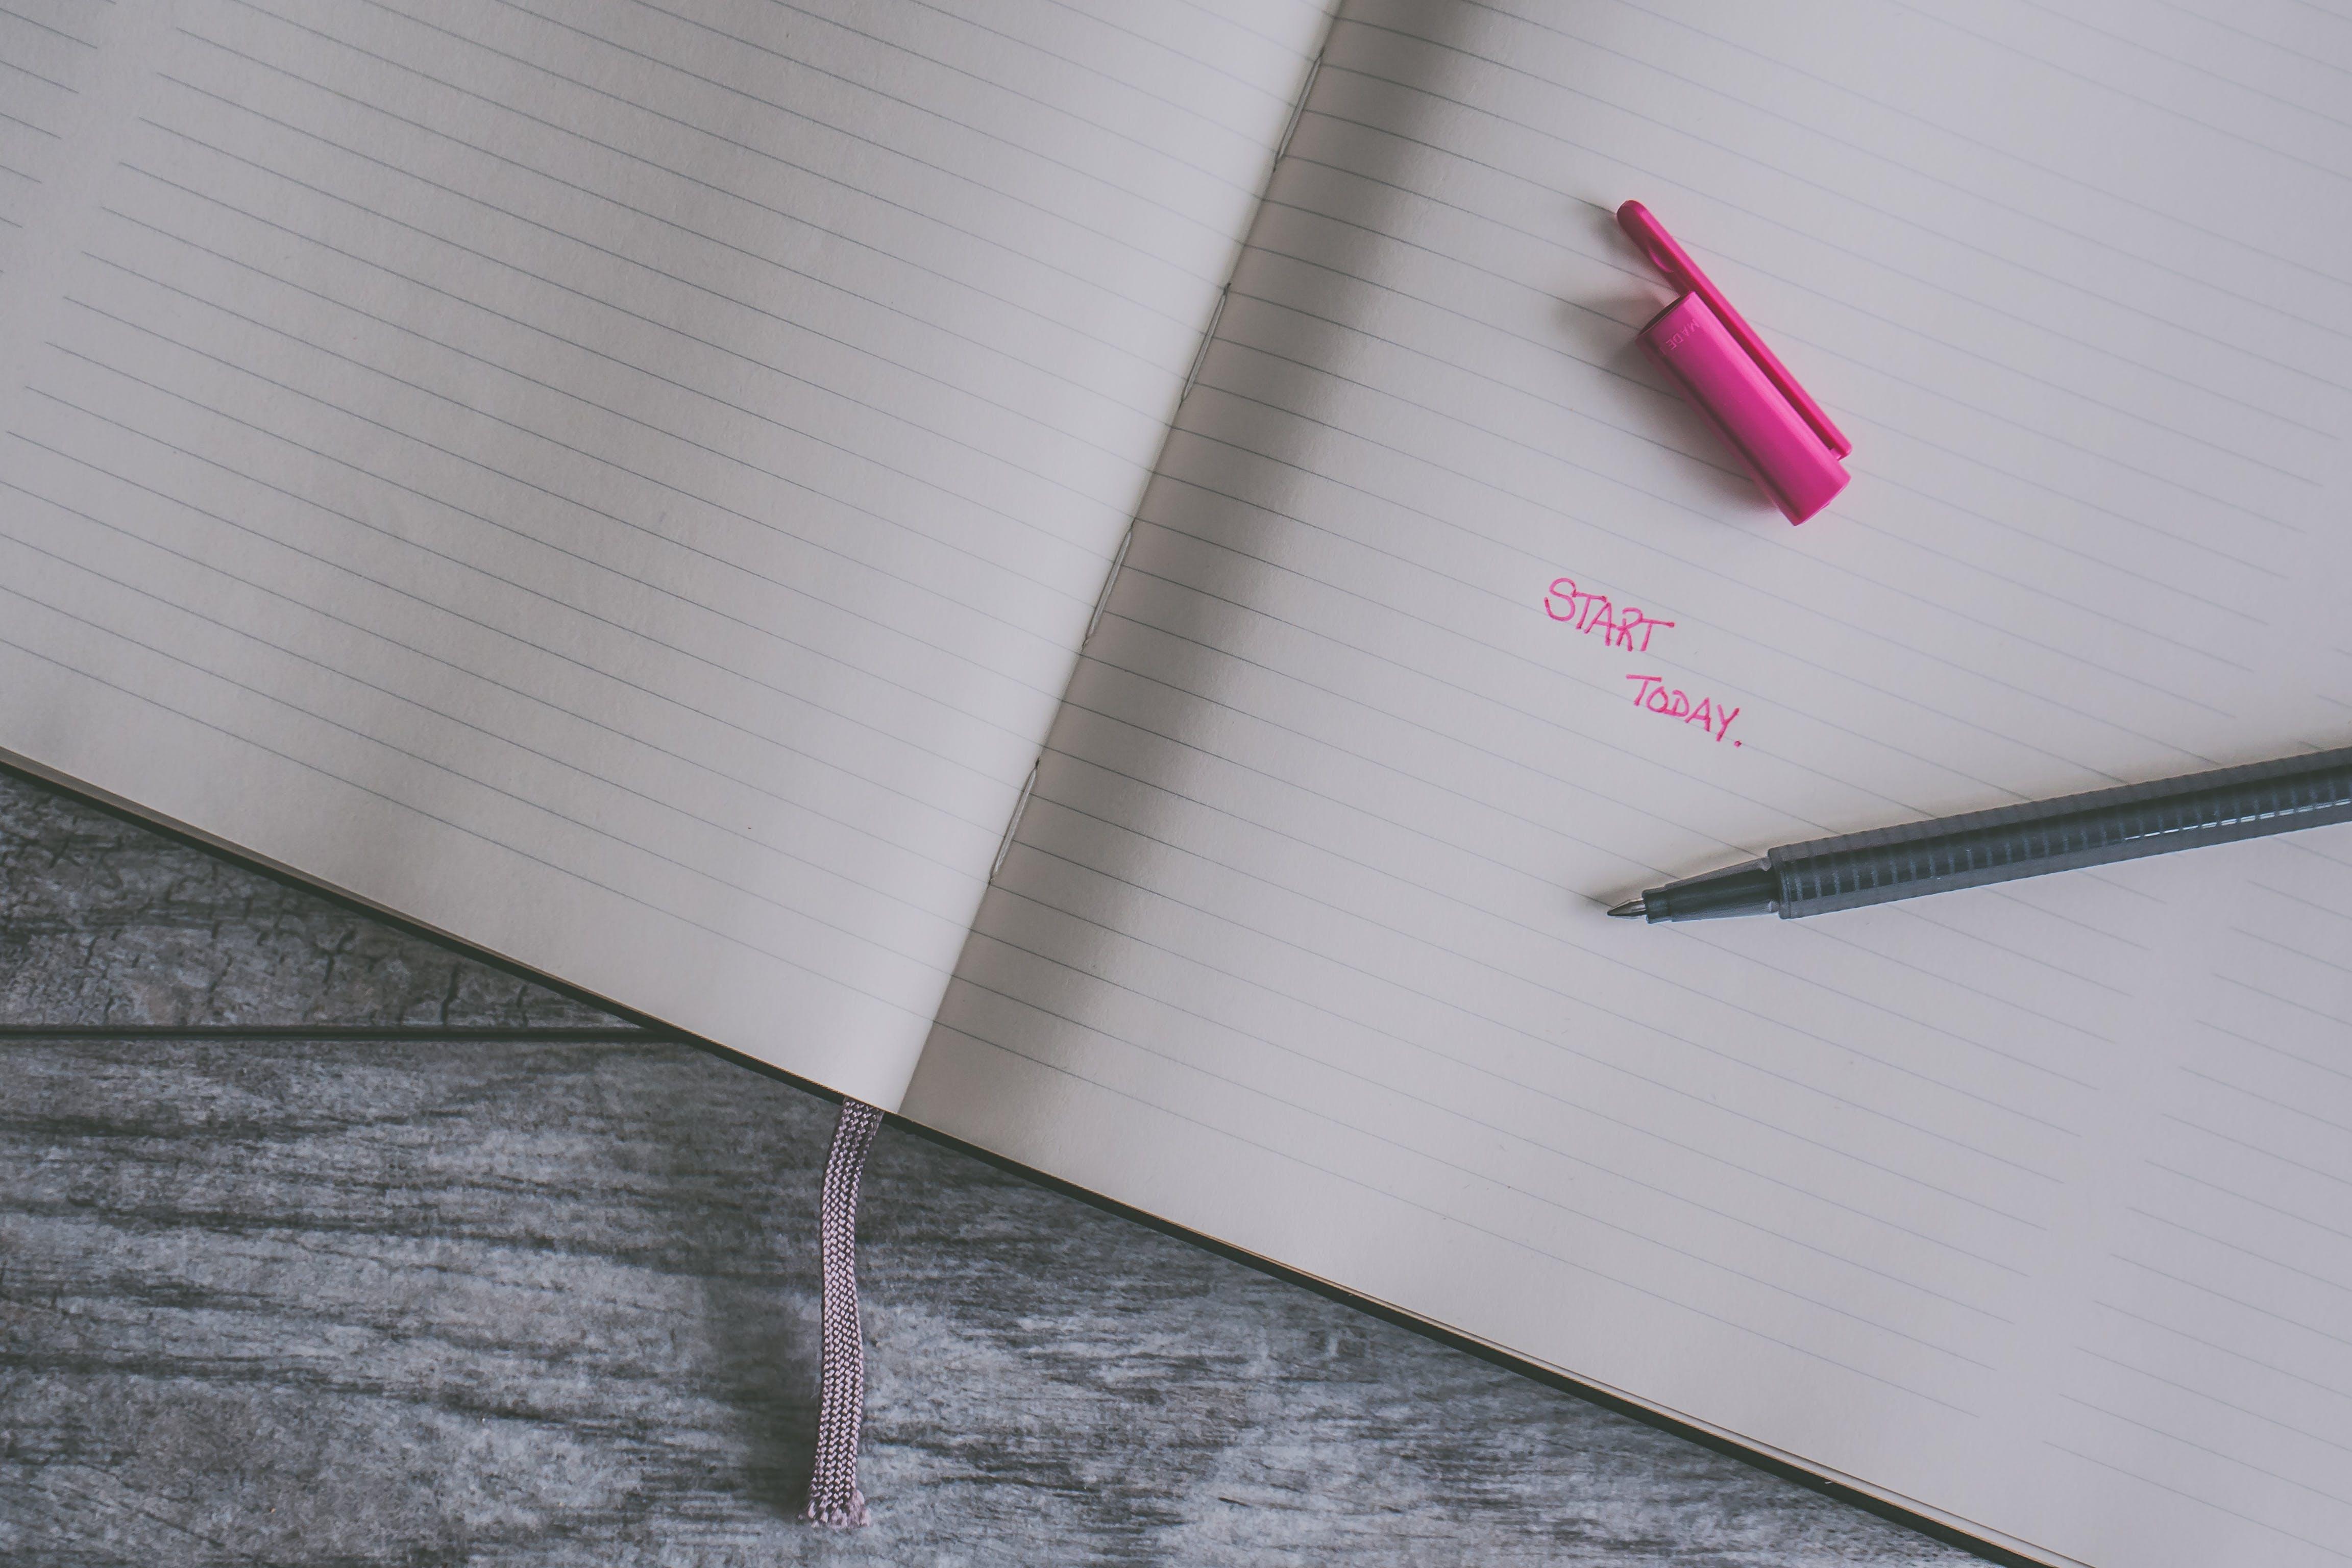 Pink Ballpoint Pen on White Ruled Paper